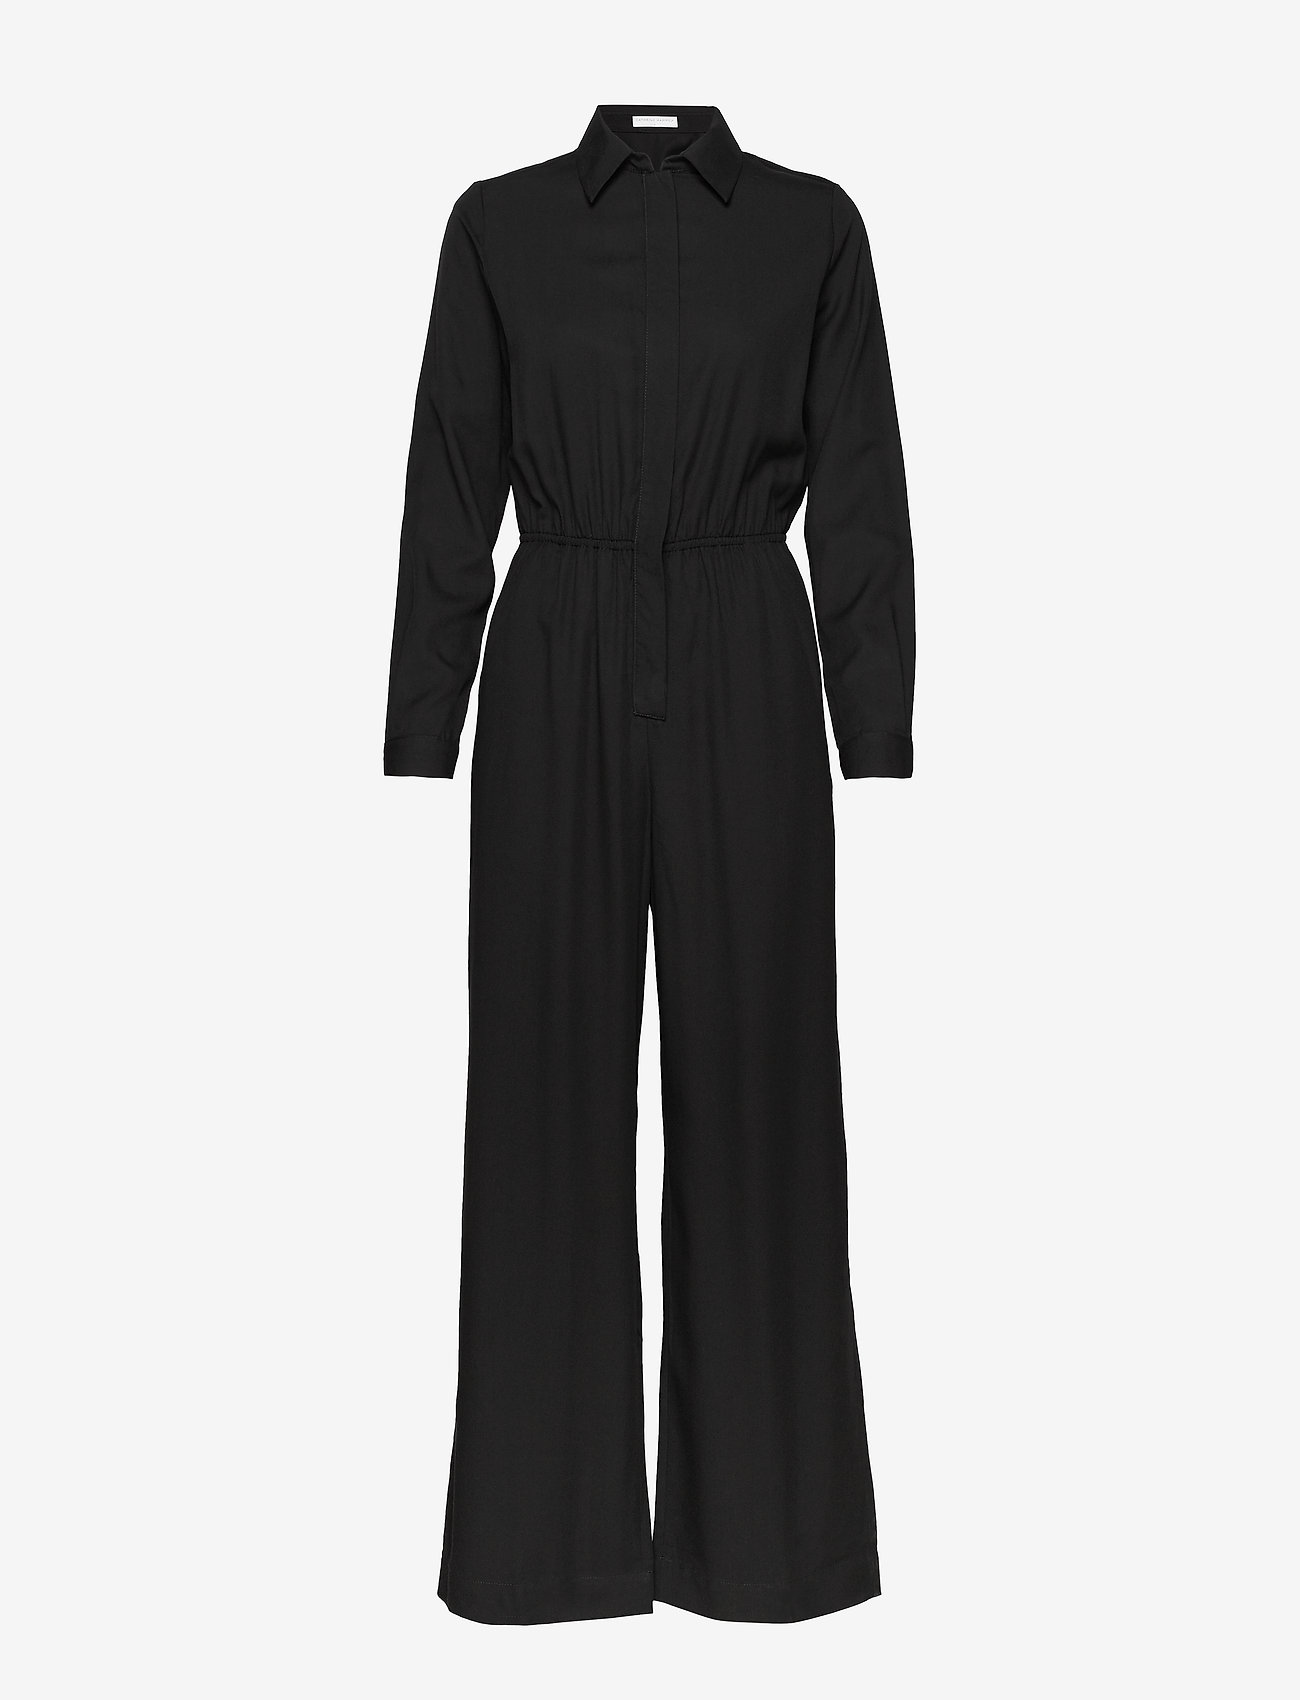 Cathrine Hammel Tracksuit - Jumpsuits Black